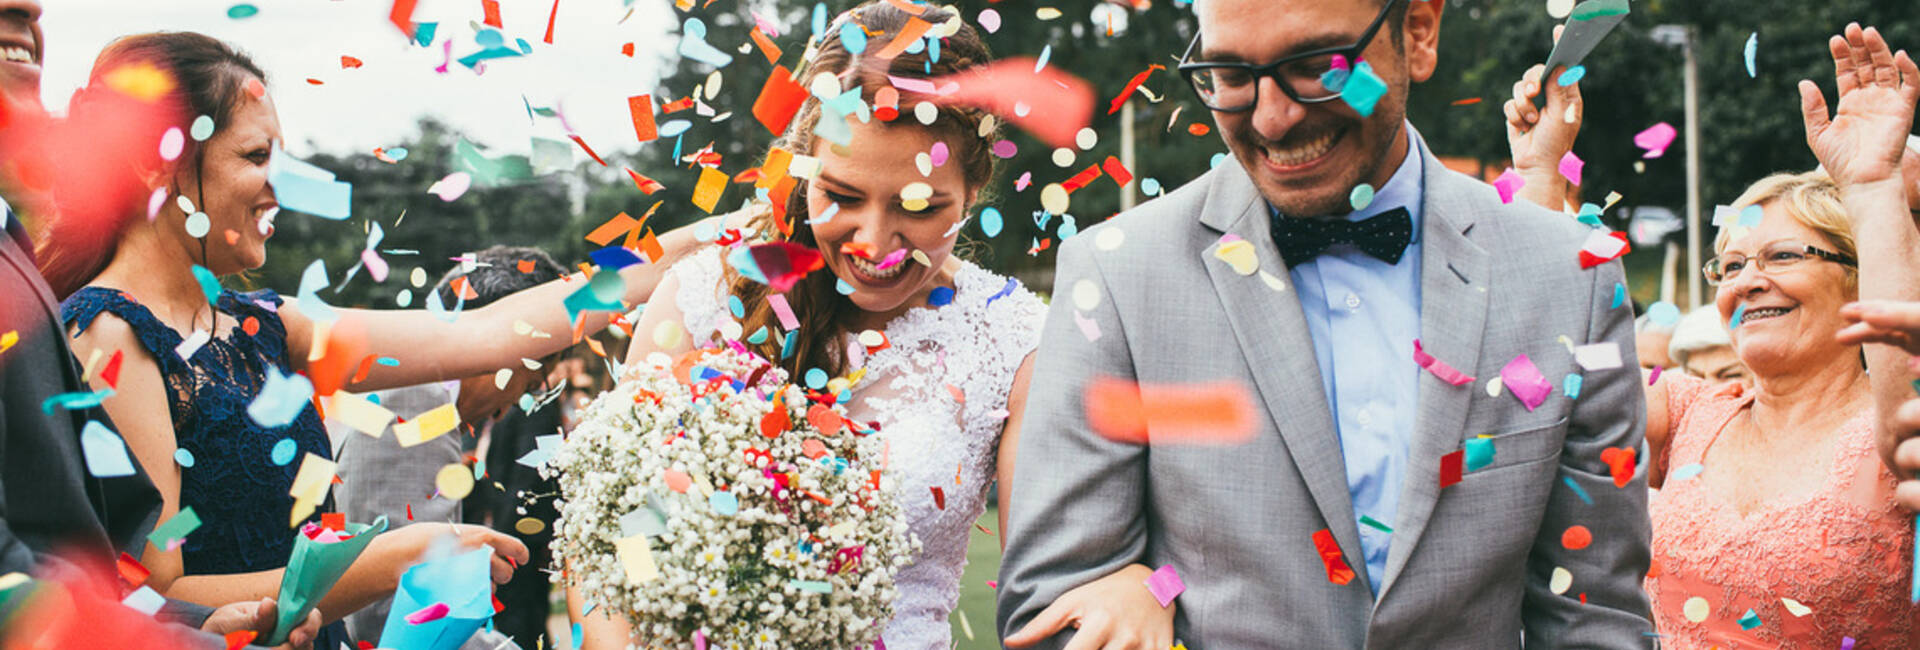 Casamento de Ariane e Felipe